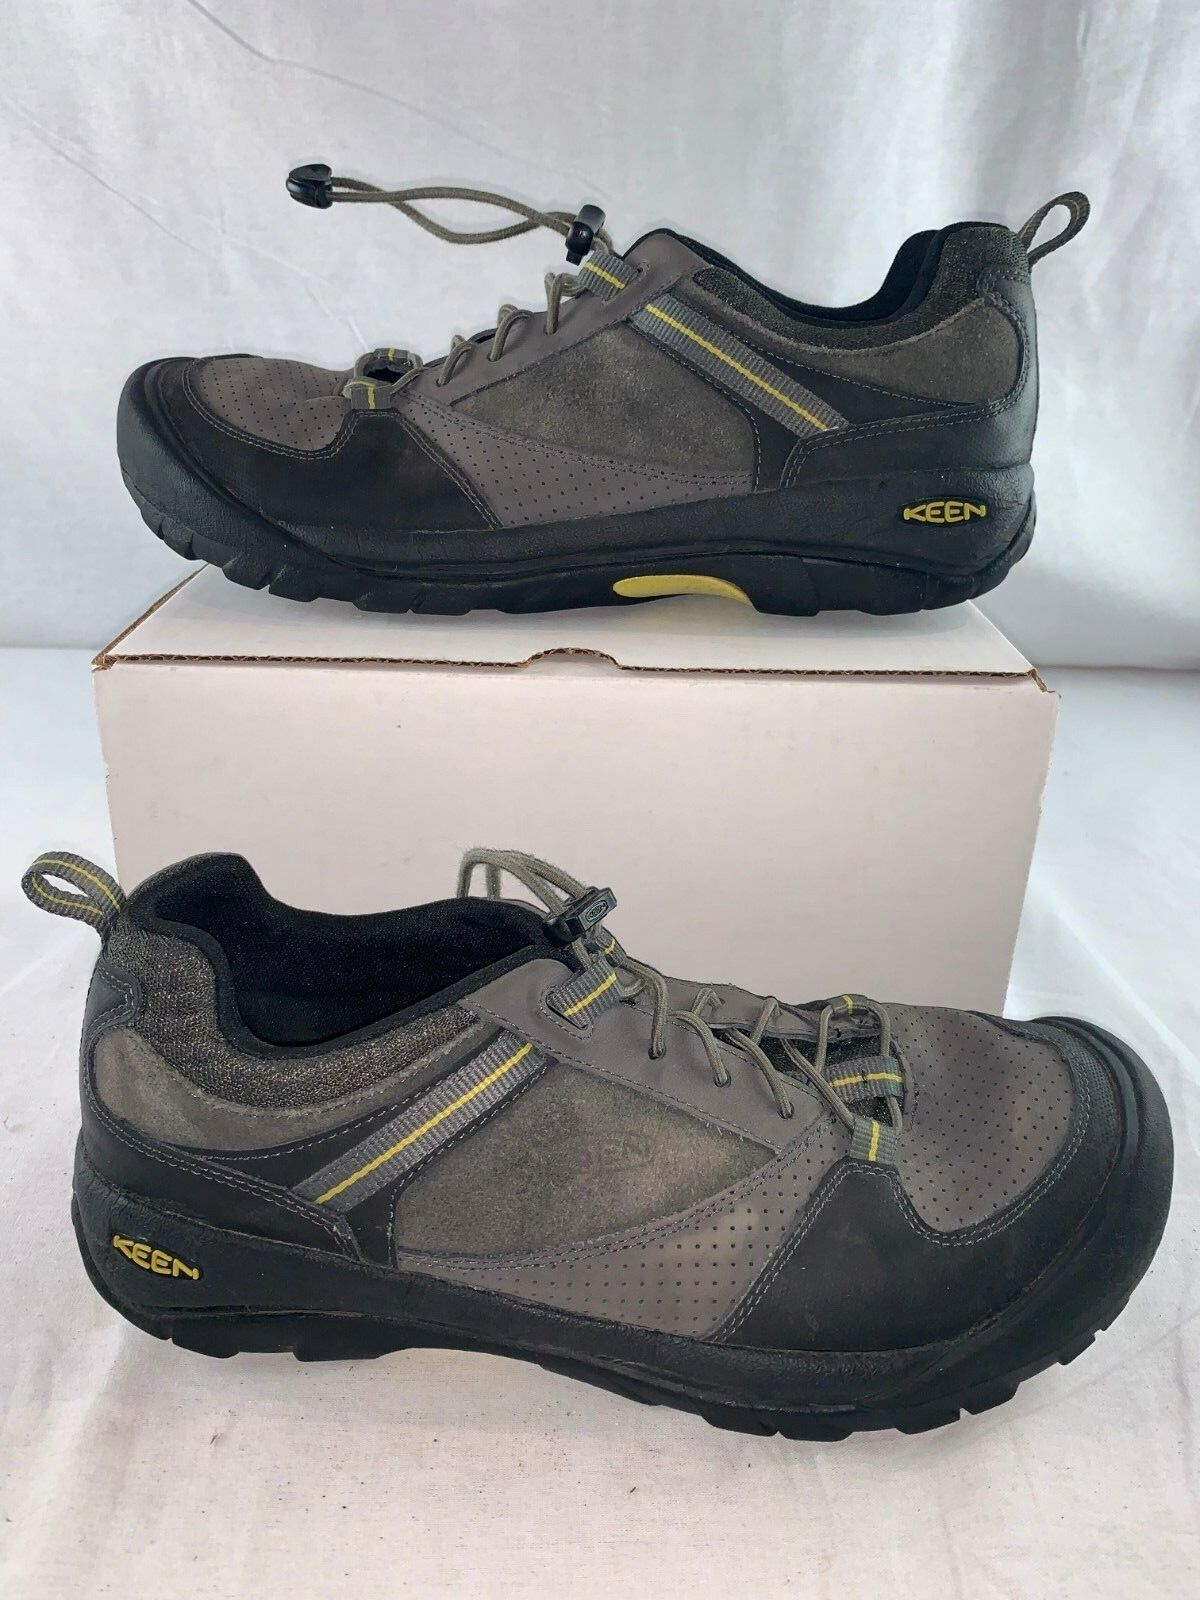 KEEN Men's Montford m Fashion Sneaker  1014366  Magnet  SIZE 11.5